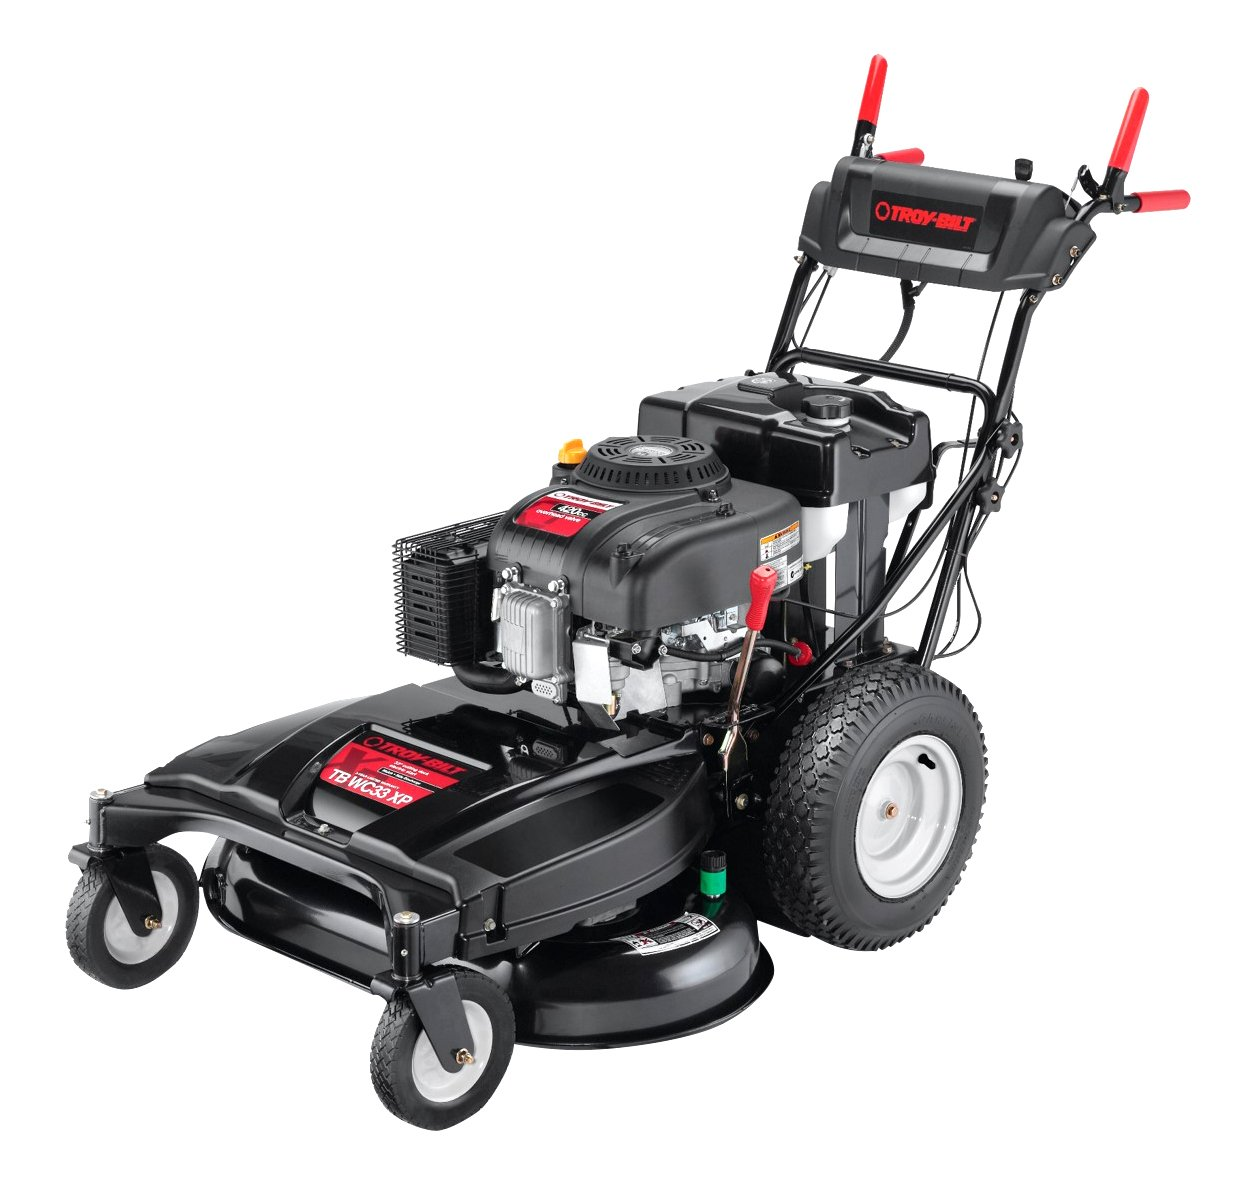 Troy Bilt Wc33 420cc 33 Inch Wide Cut Rwd Lawn Mower Mtd Drive Belt Diagram Car Tuning With Electric Start Garden Outdoor